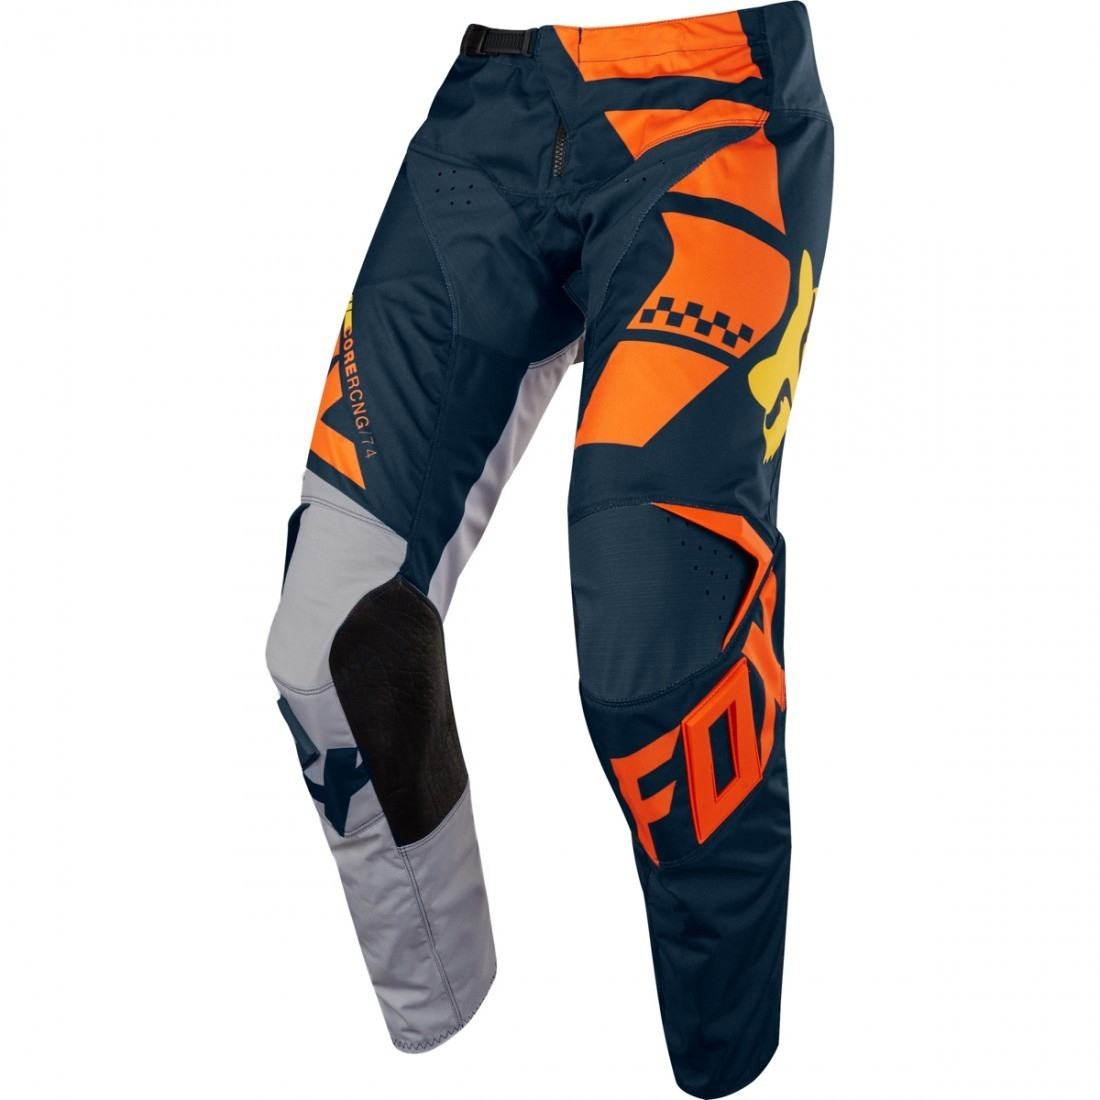 dddac10940e3c 91 Pantalones de motocross